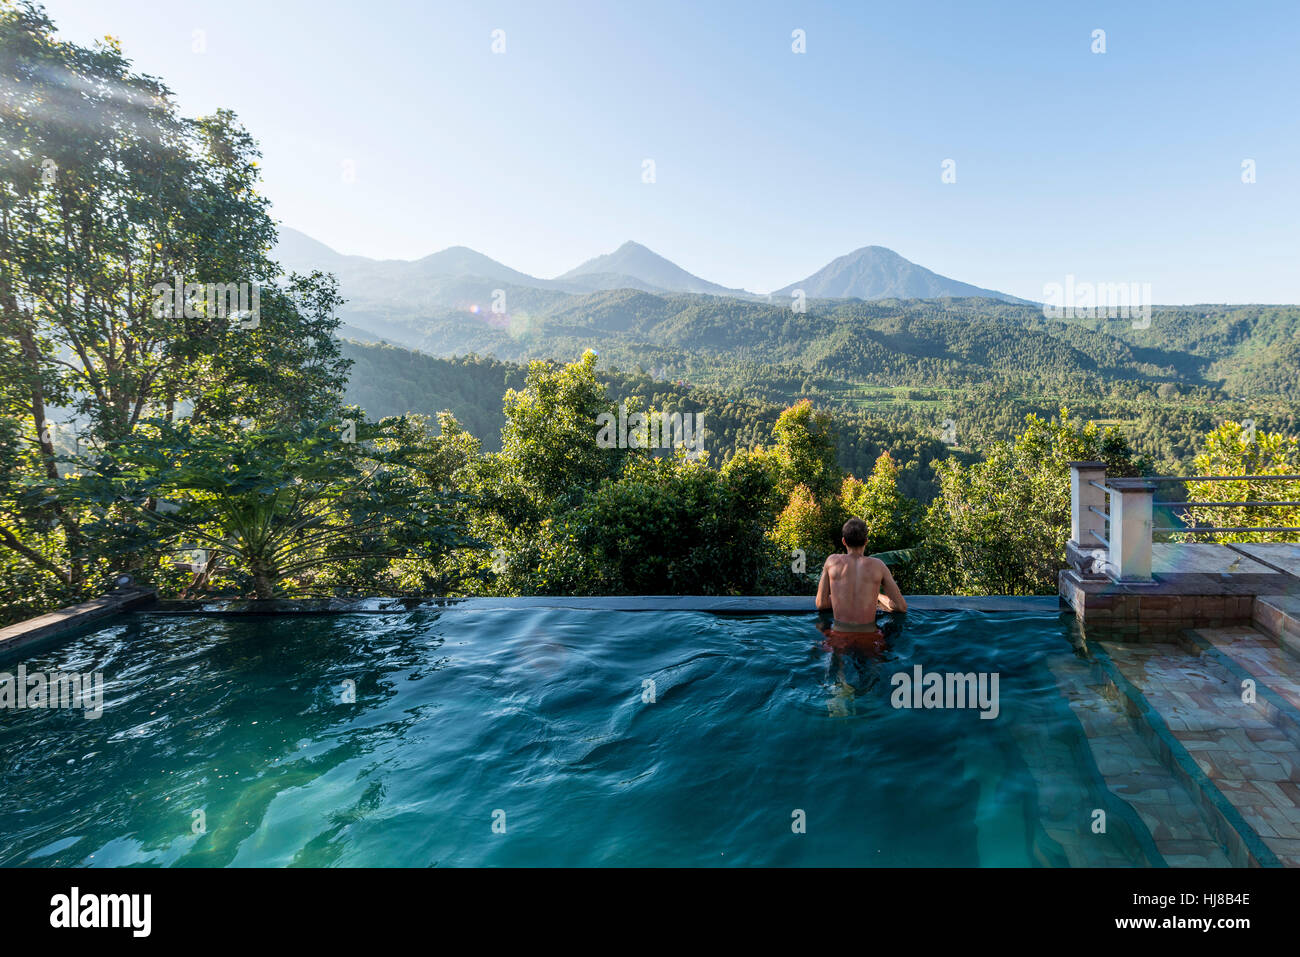 Hombre mirando el paisaje, piscina, Munduk, Bali, Indonesia Imagen De Stock